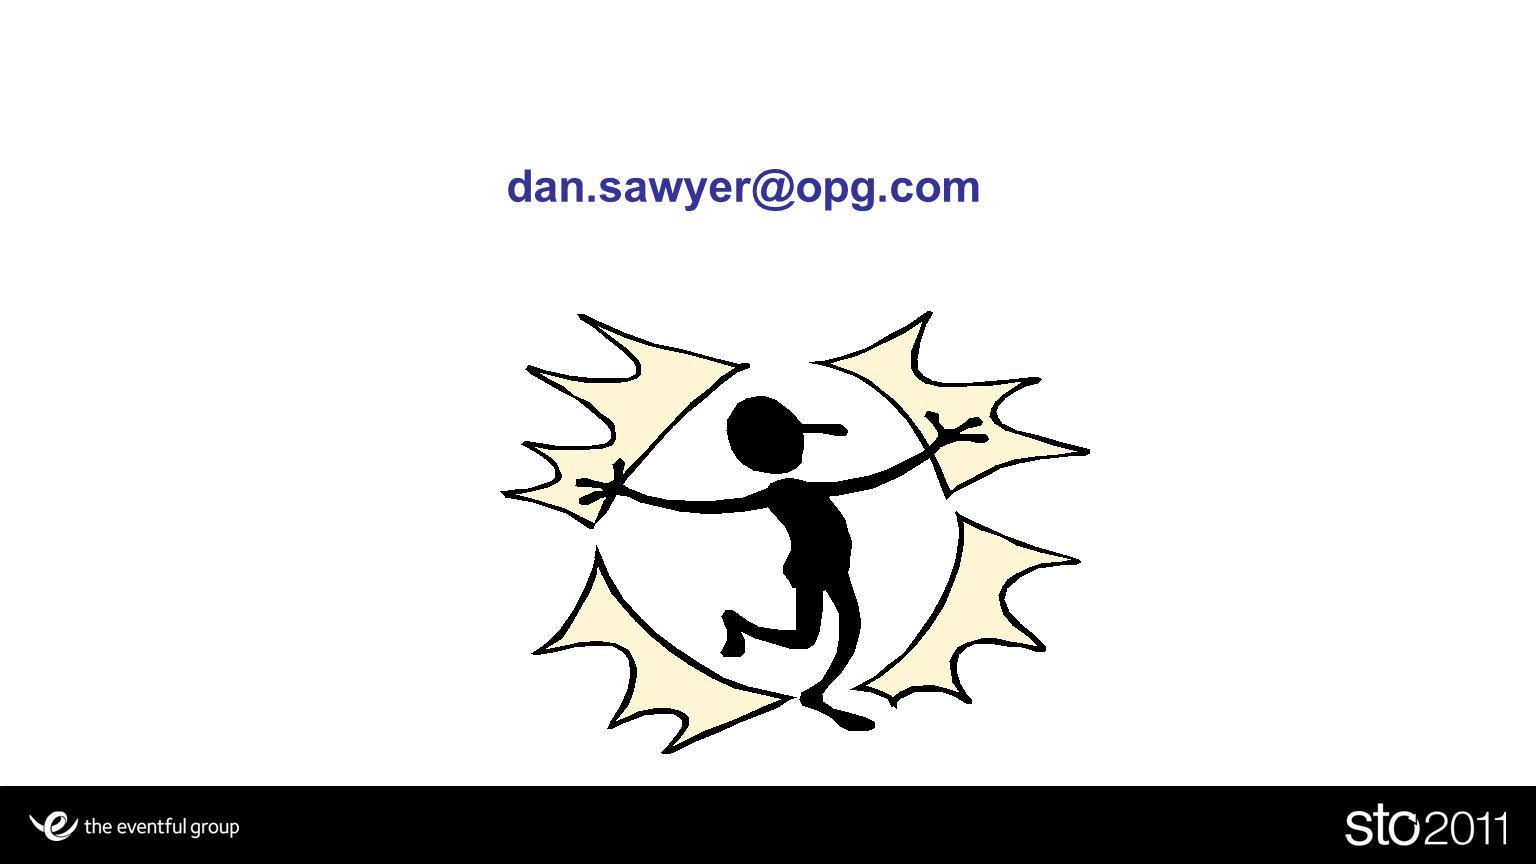 dan.sawyer@opg.com